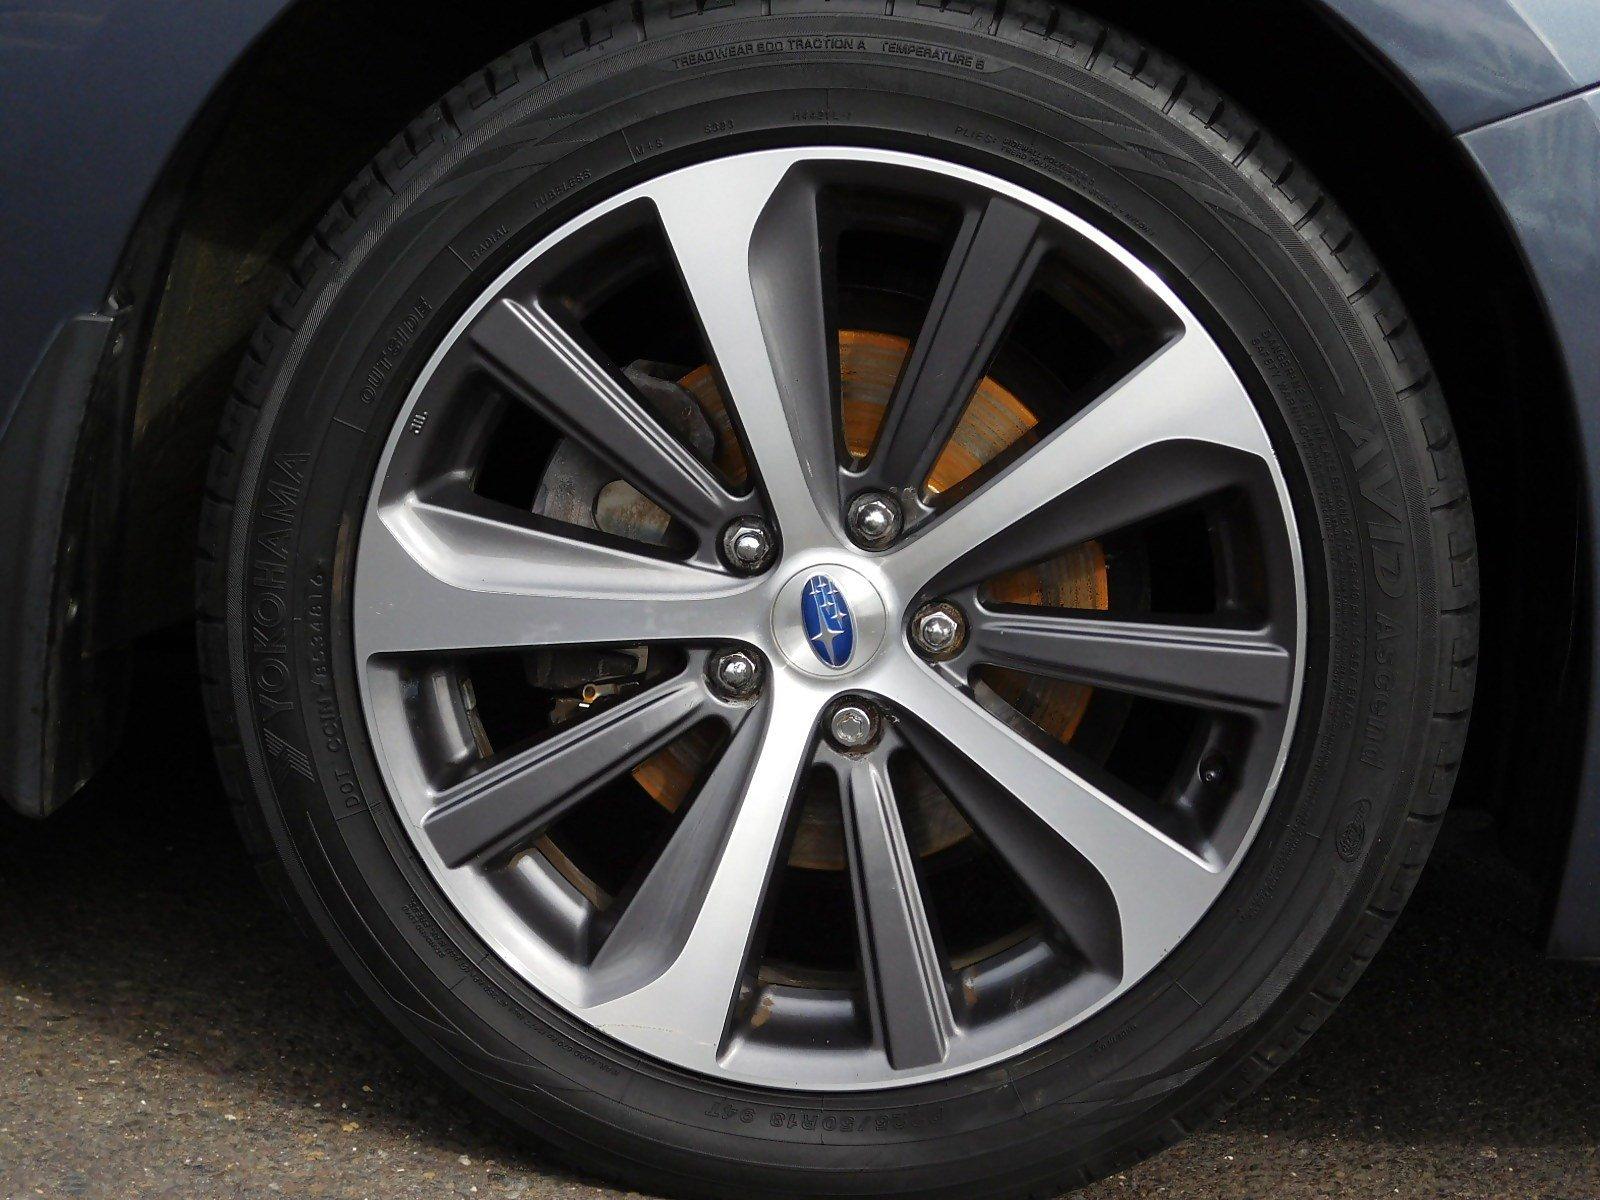 Pre-Owned 2015 Subaru Legacy 2.5i Limited